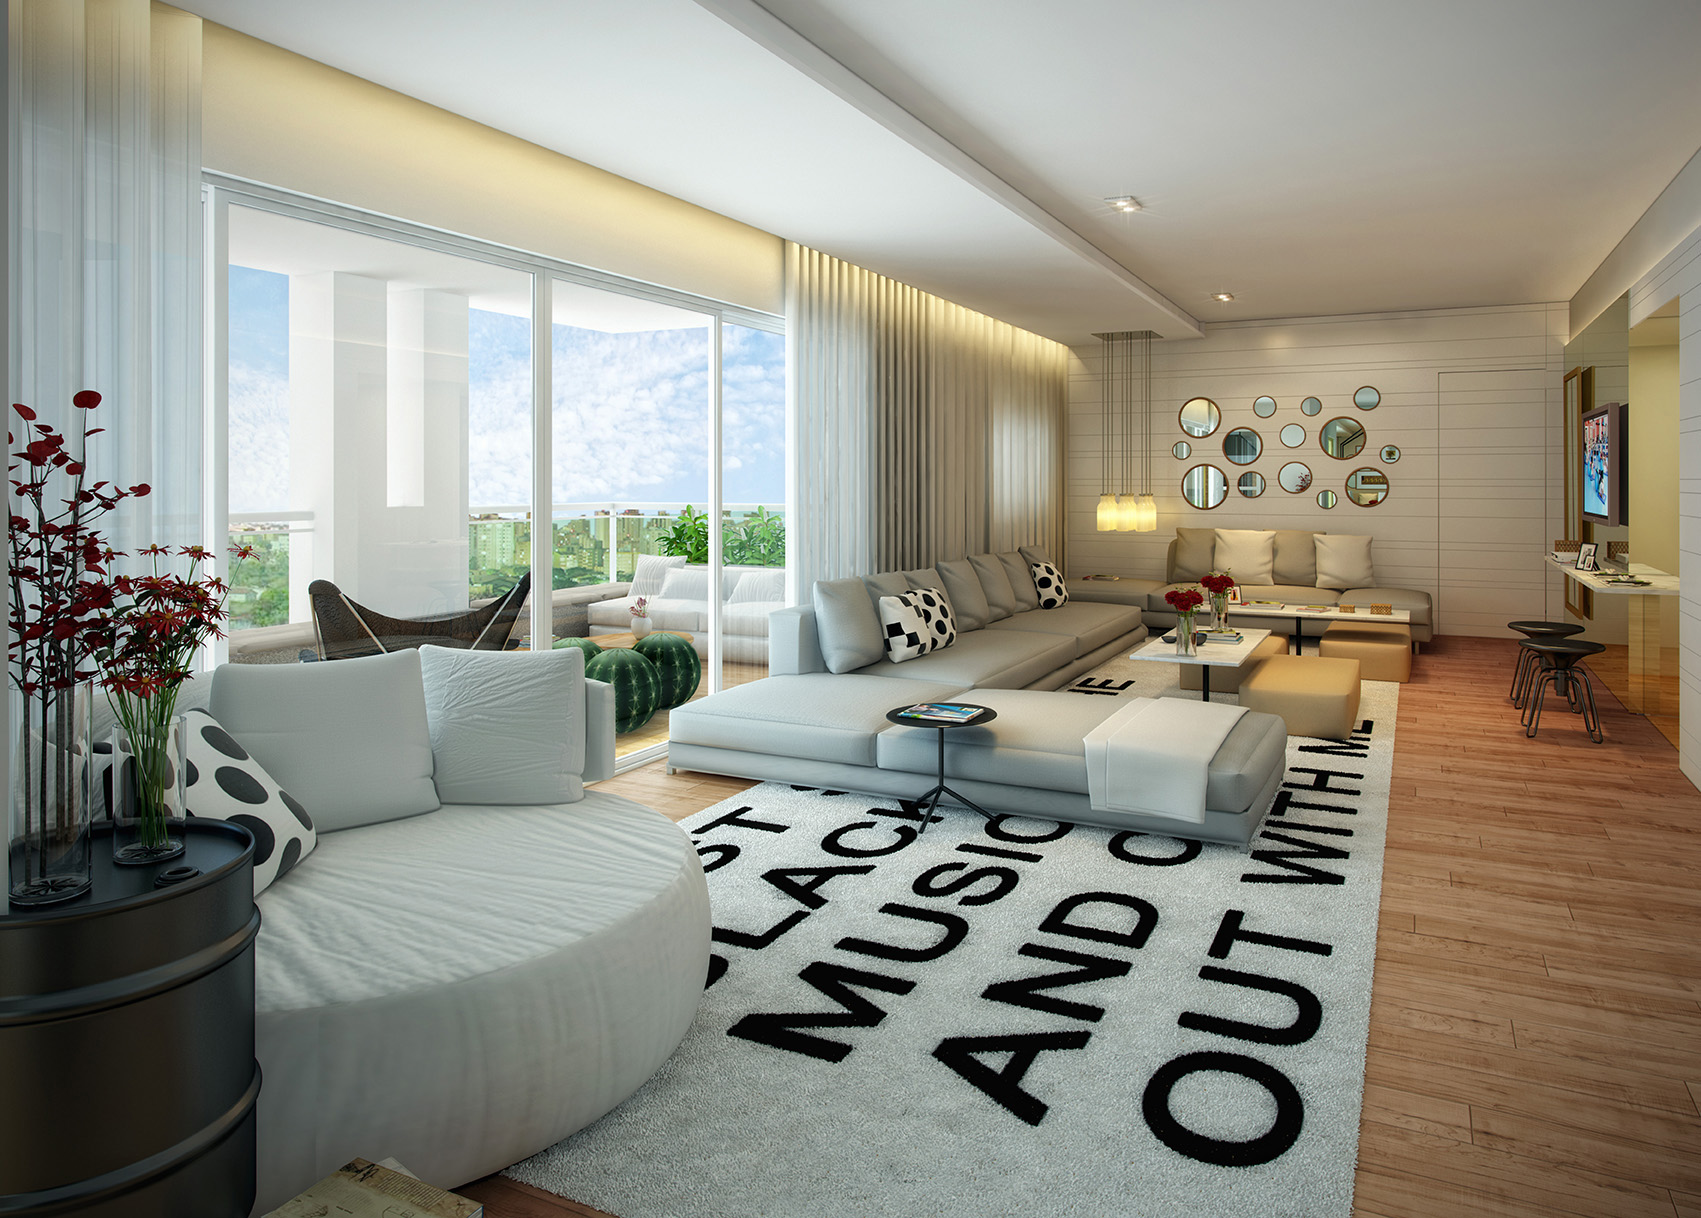 Living - 197 m²